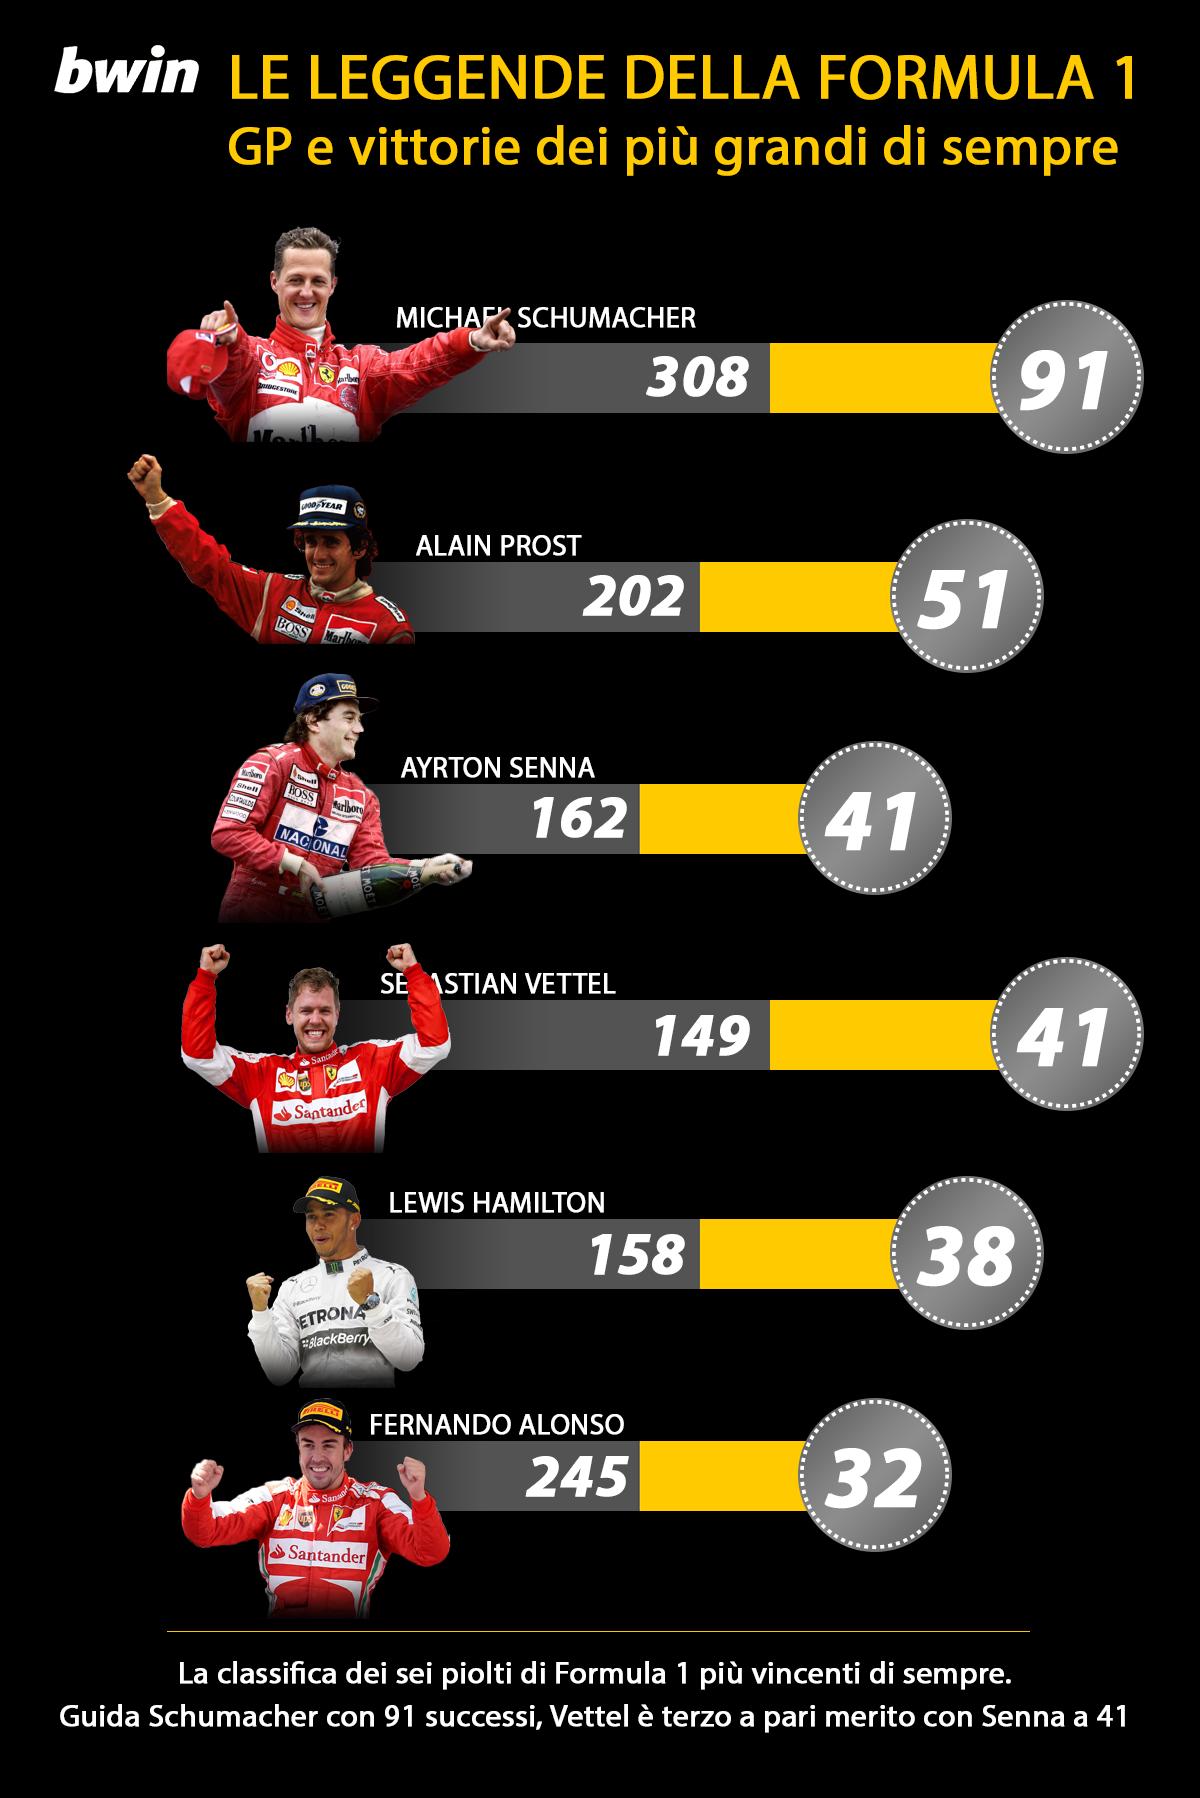 infografica BWIN 1 F1